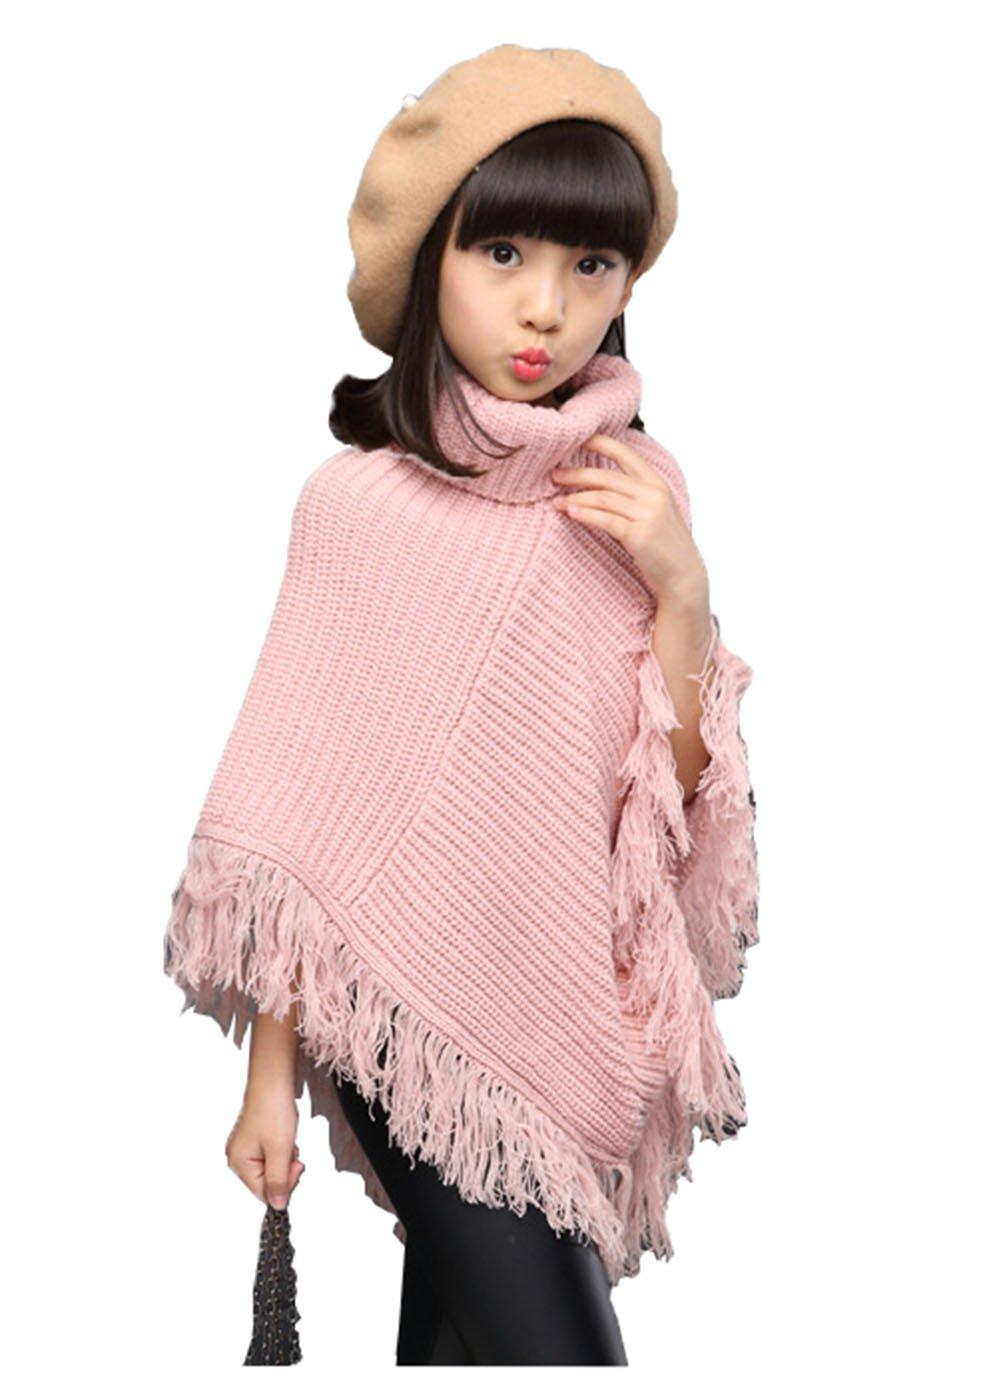 Fankeshi Girls High Neck Knitted Poncho Tassel Draped Cloak Coat Cape Sweater (Pink, 11-13 Years)